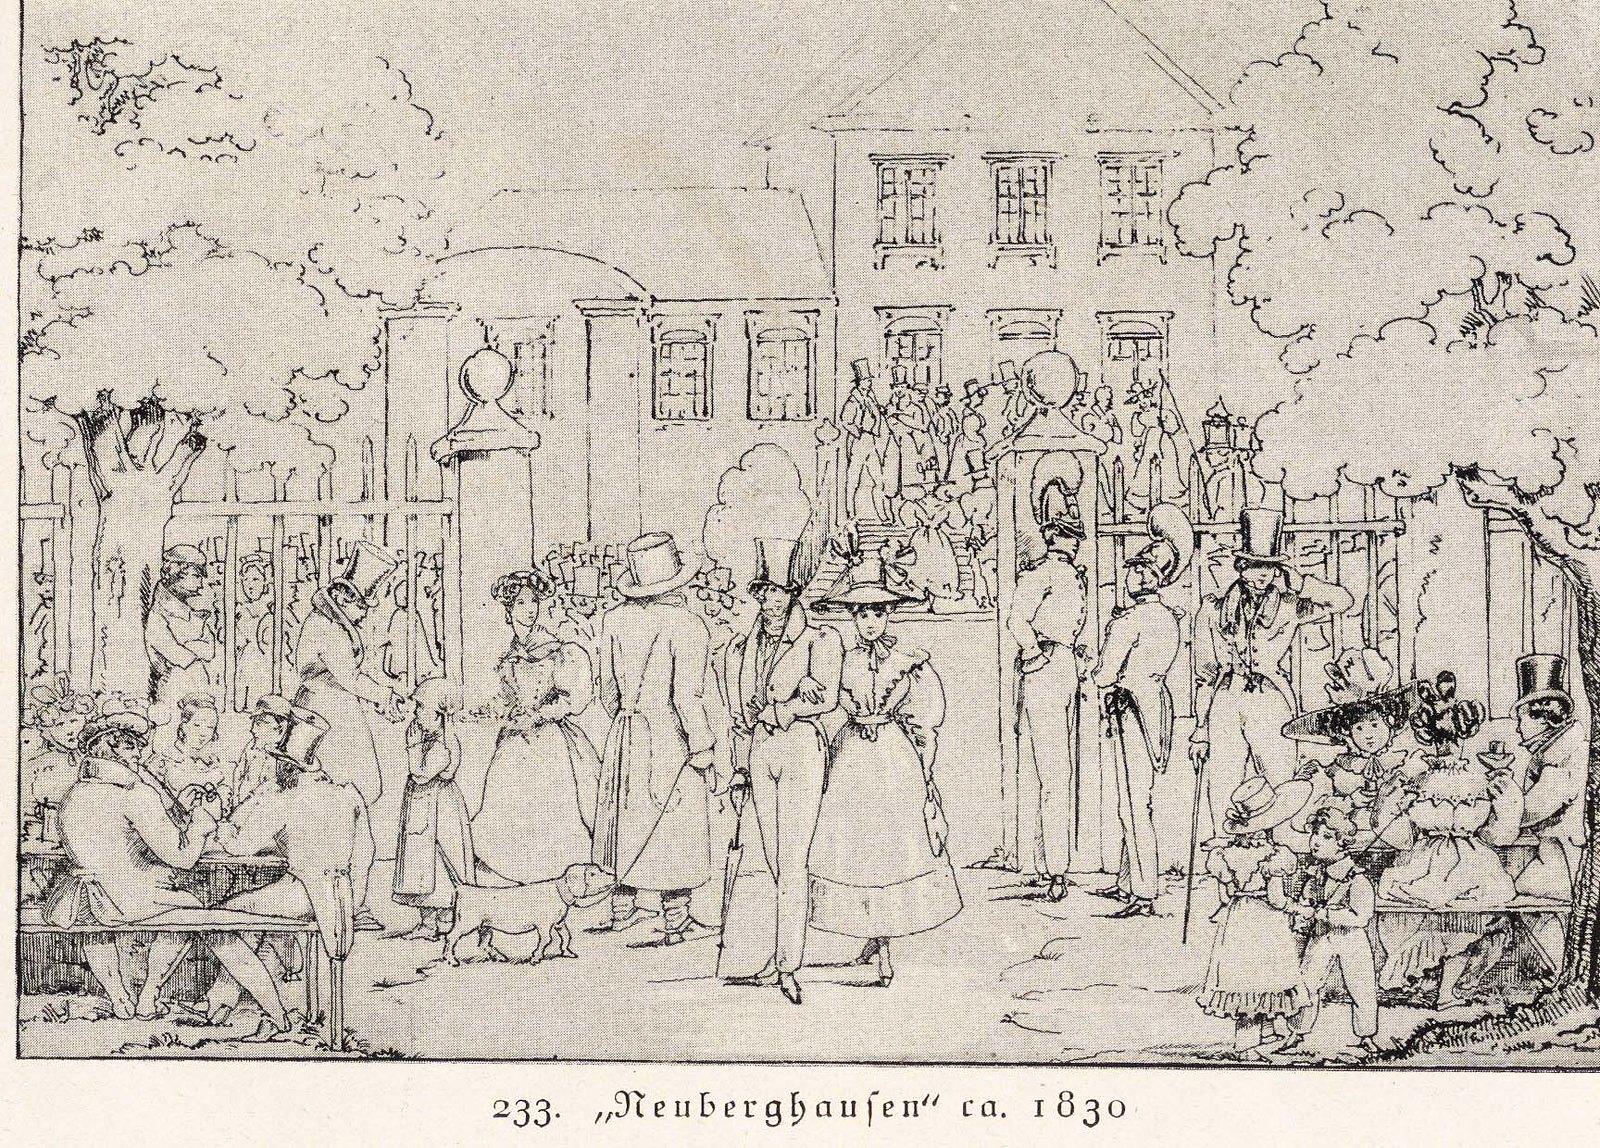 Neuberghausen, Lithorgraphie 1830 via Literaturportal Bayern